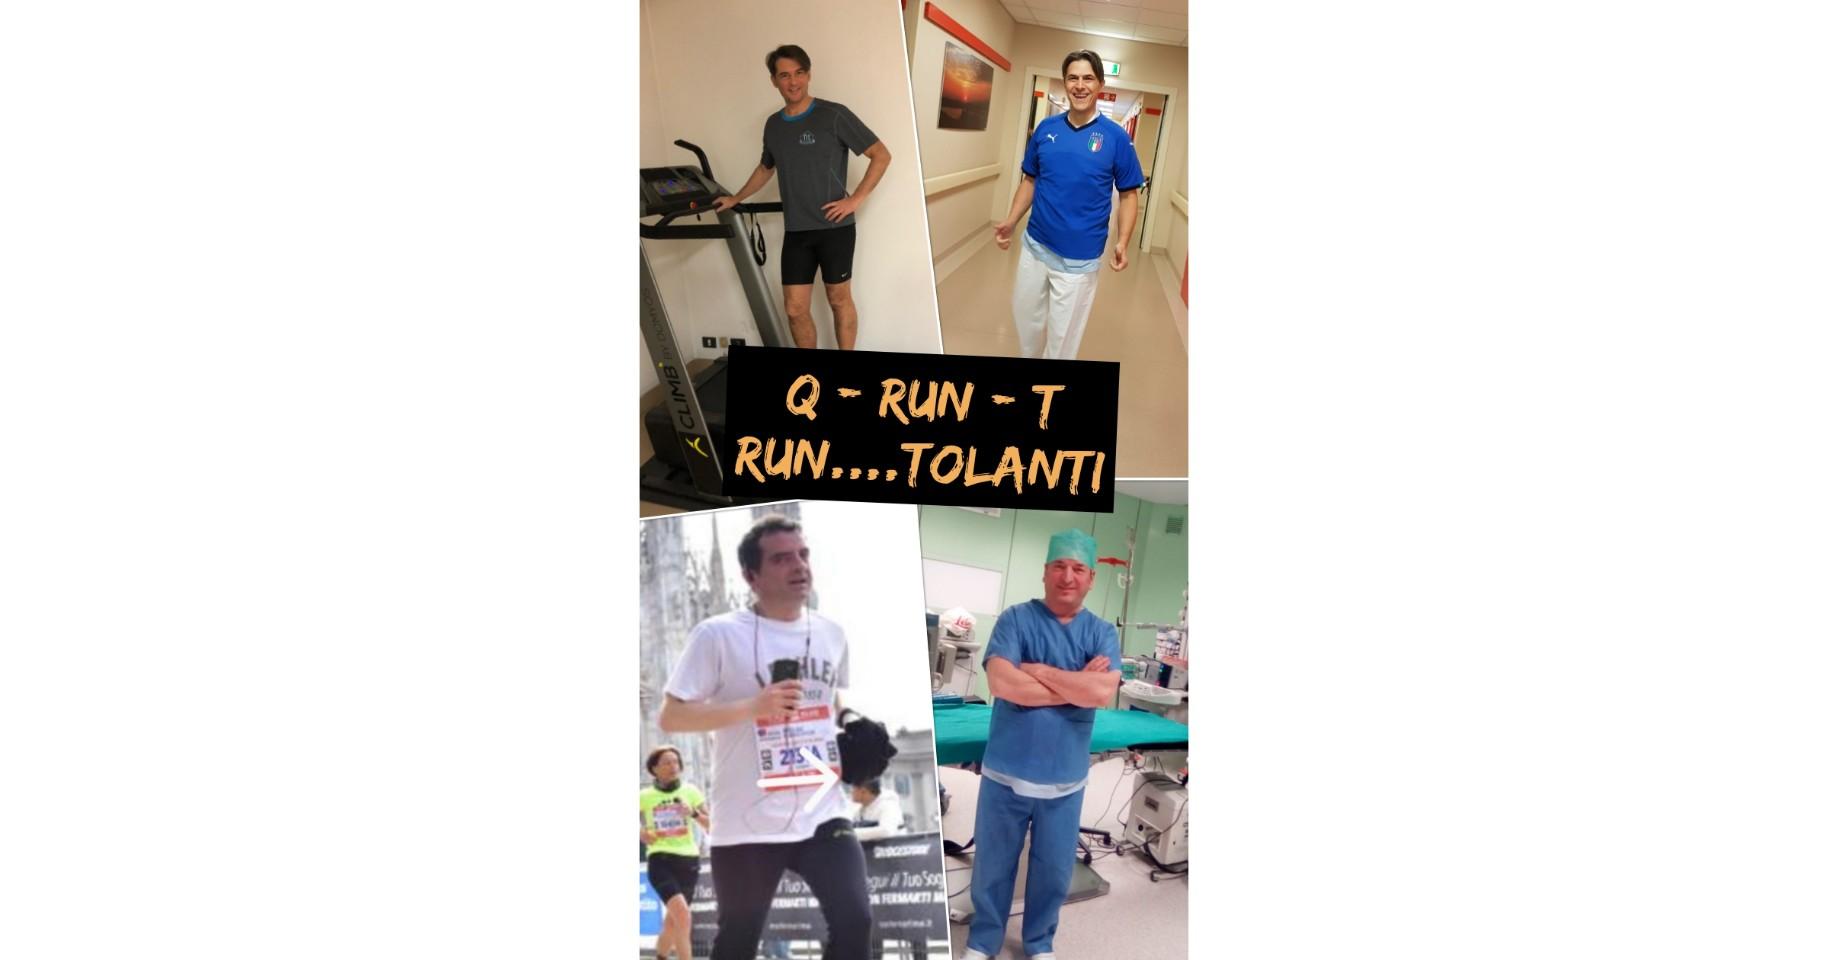 Q-RUN-T......RUN-TOLANTI-ANTONIO